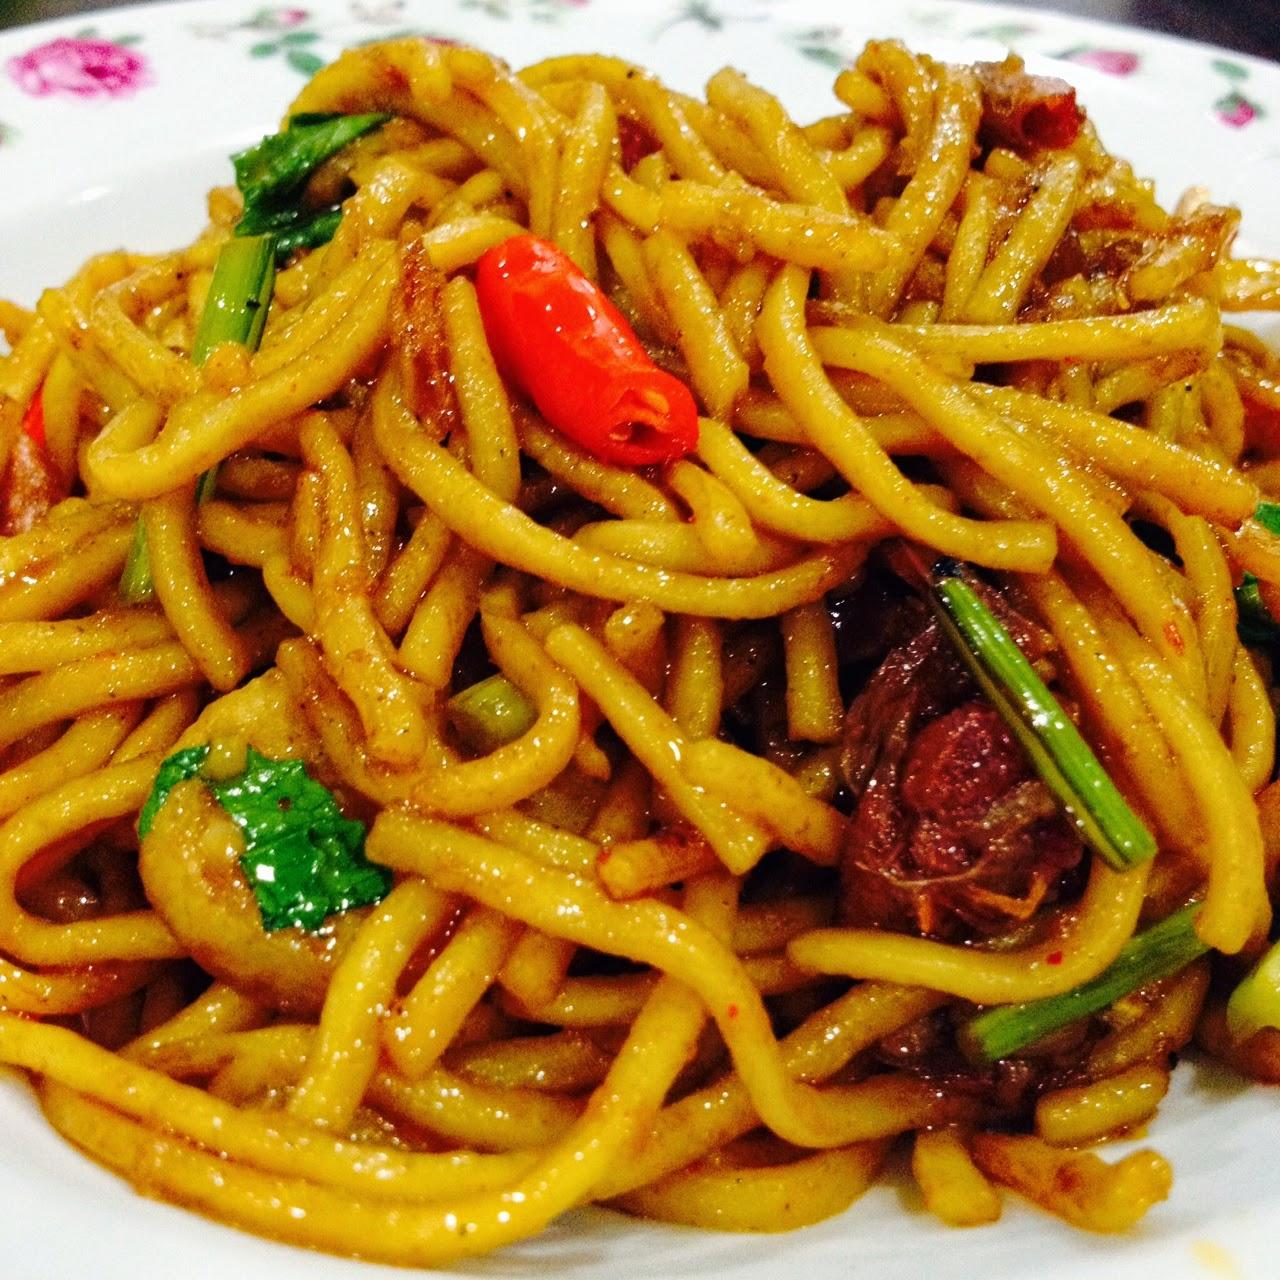 cik wan kitchen mee goreng mudah  mee goreng talam Resepi Mee Goreng Ratna Enak dan Mudah